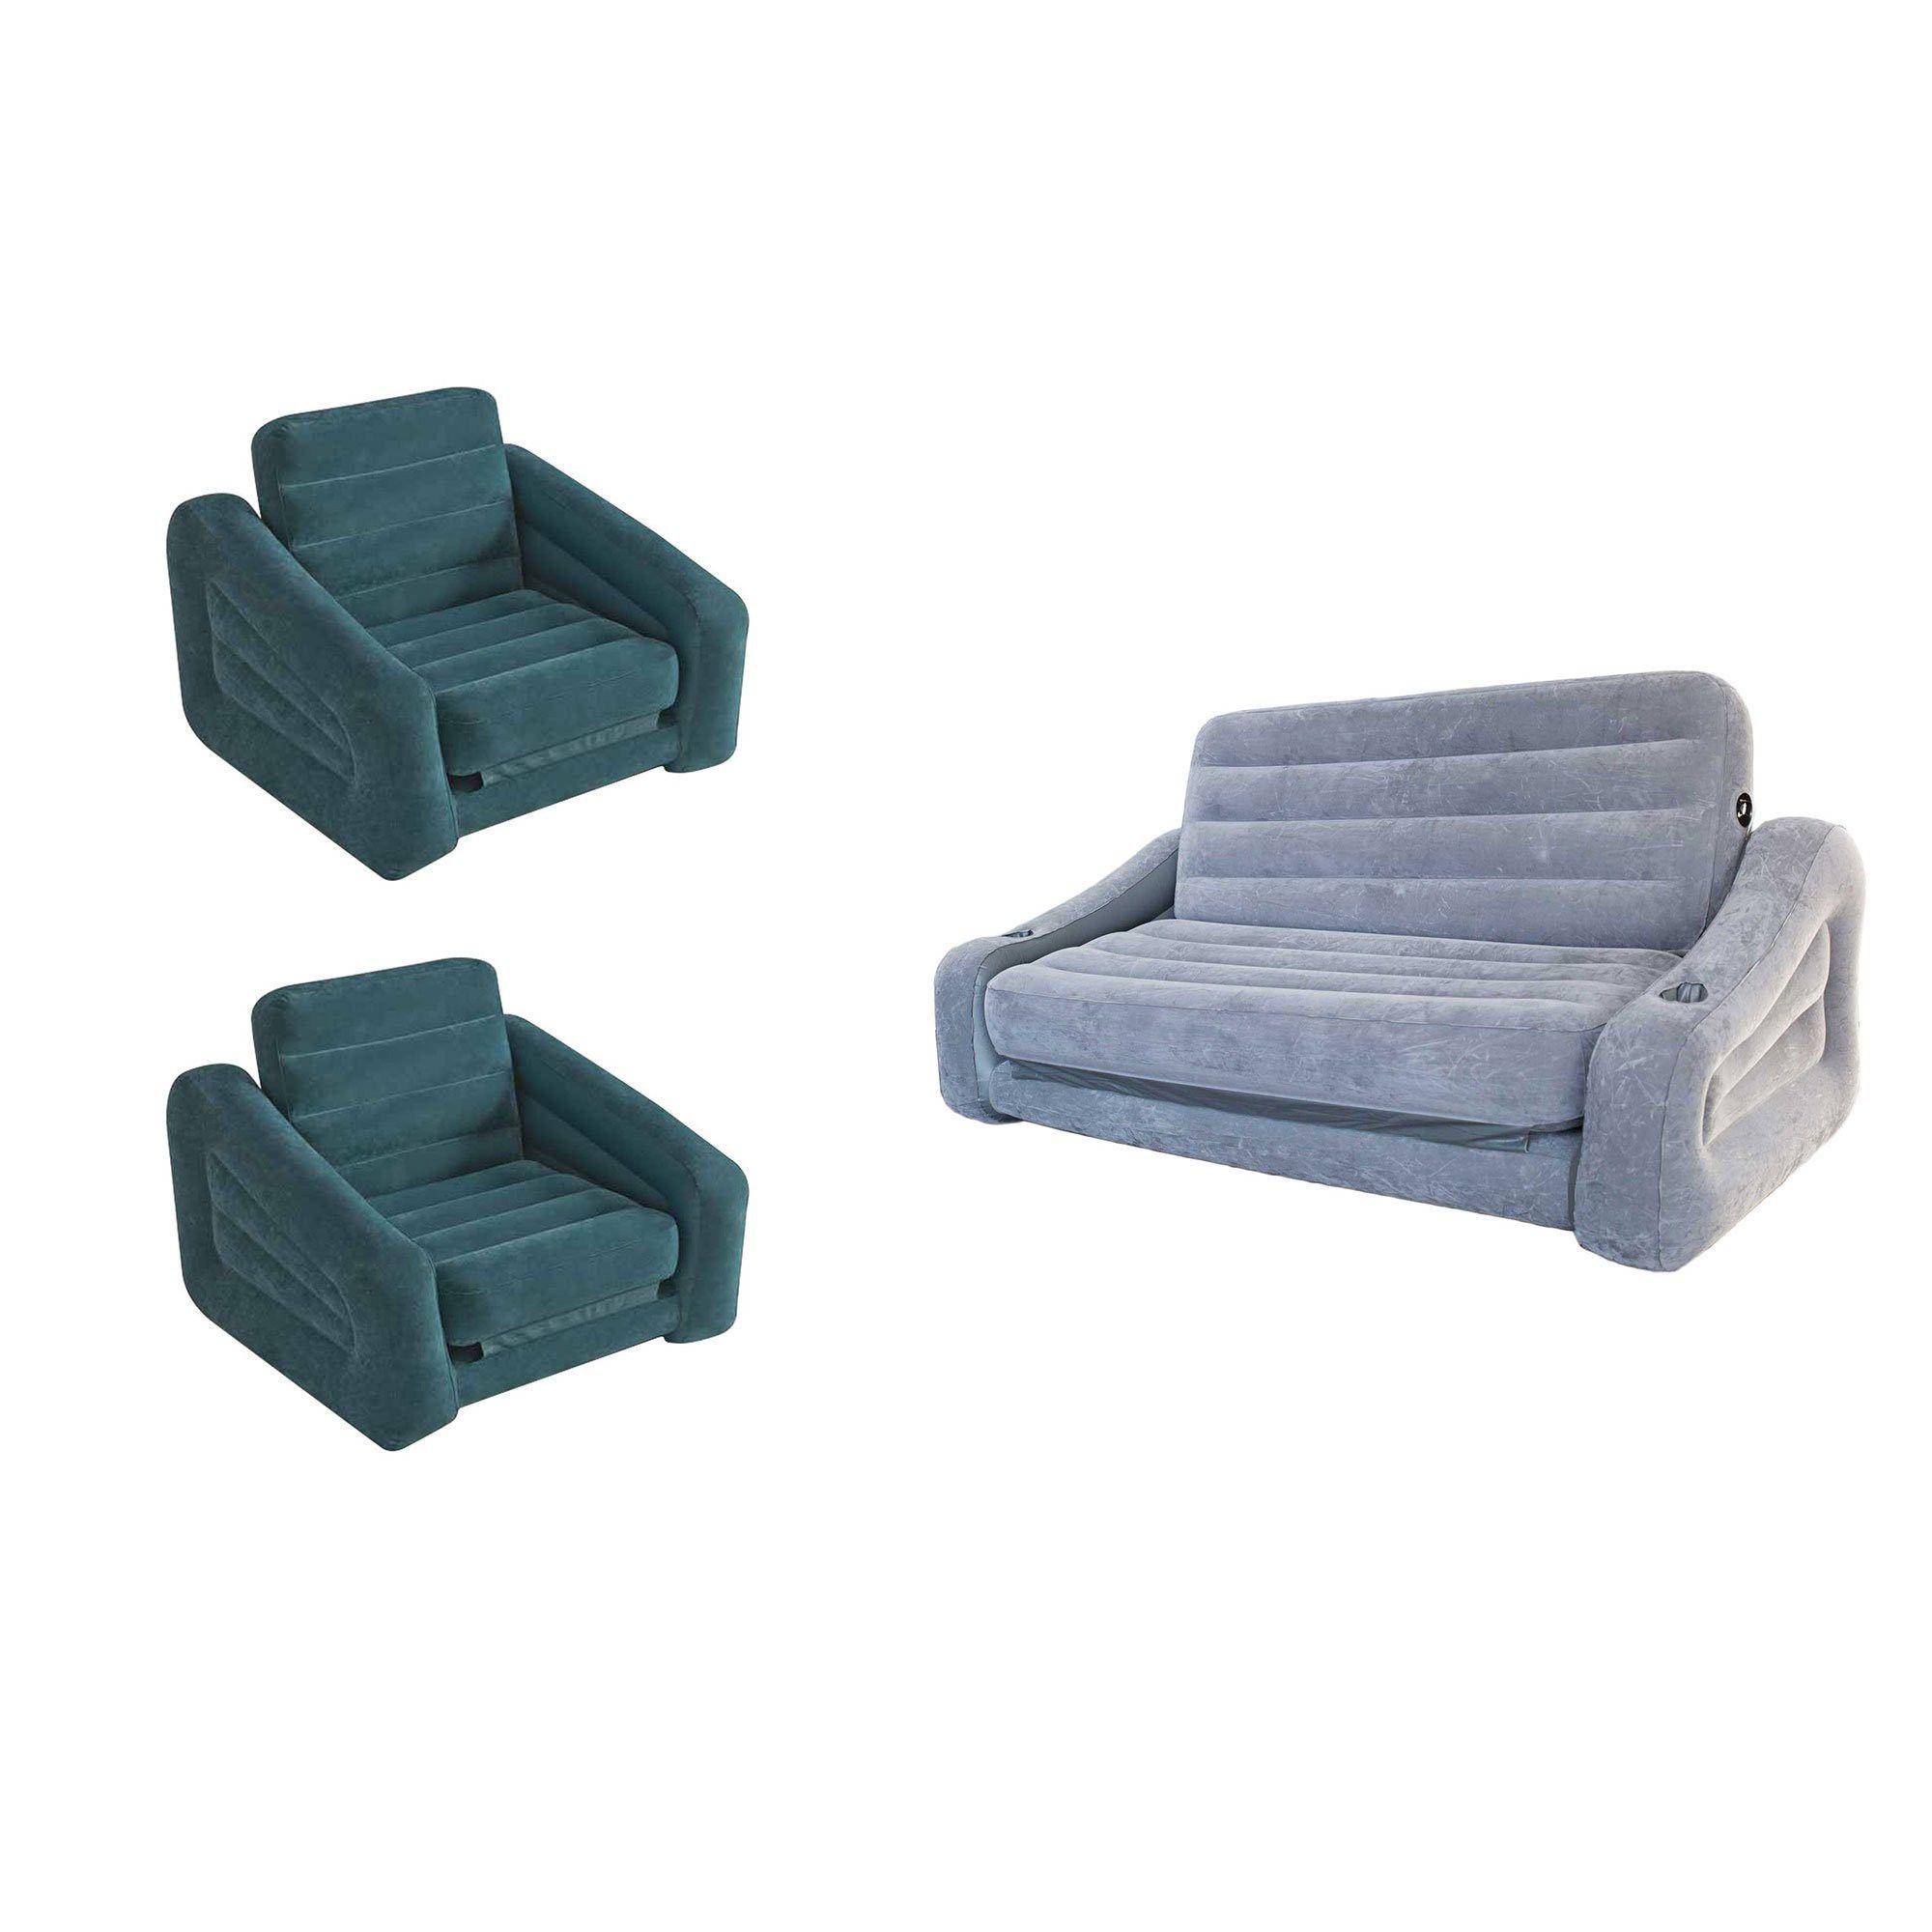 Peachy Intex Inflatable Pull Out Sofa Queen Air Mattress Chair Beatyapartments Chair Design Images Beatyapartmentscom